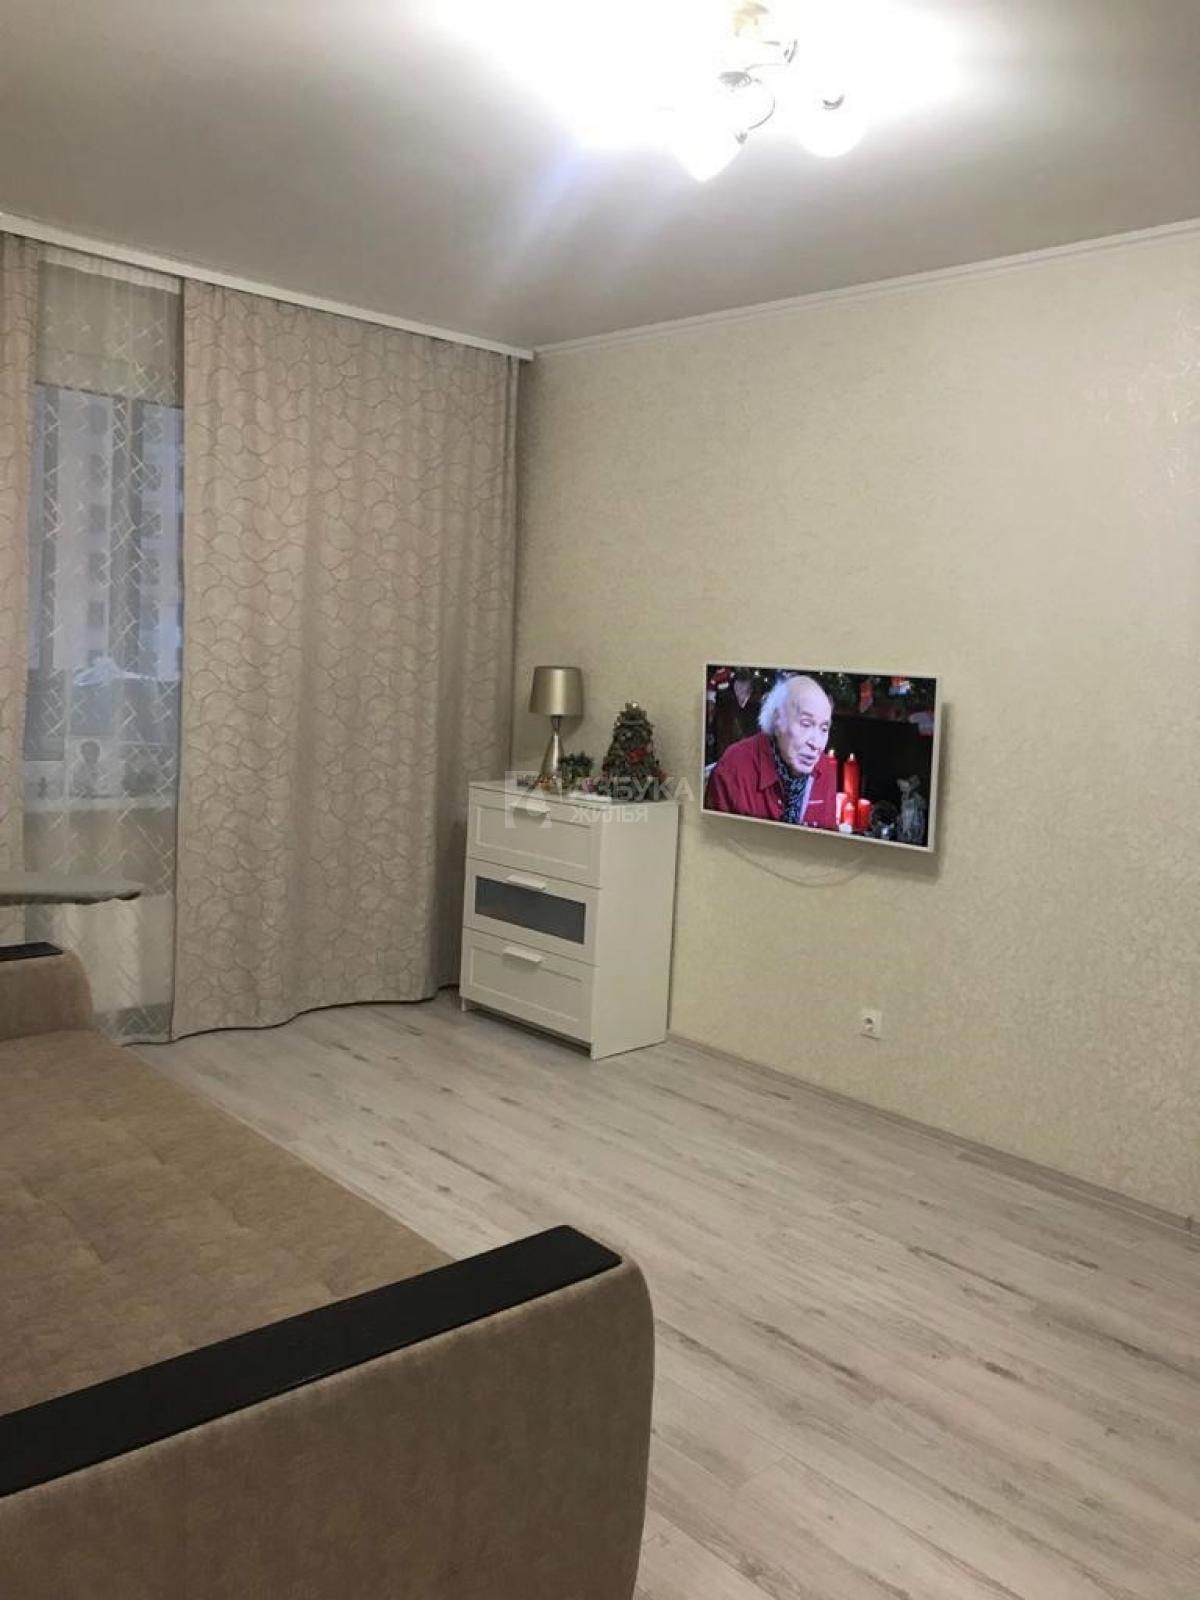 Фото №7 - 1-комнатная квартира, Москва, Дмитровское шоссе 169 корпус 4, метро Алтуфьево